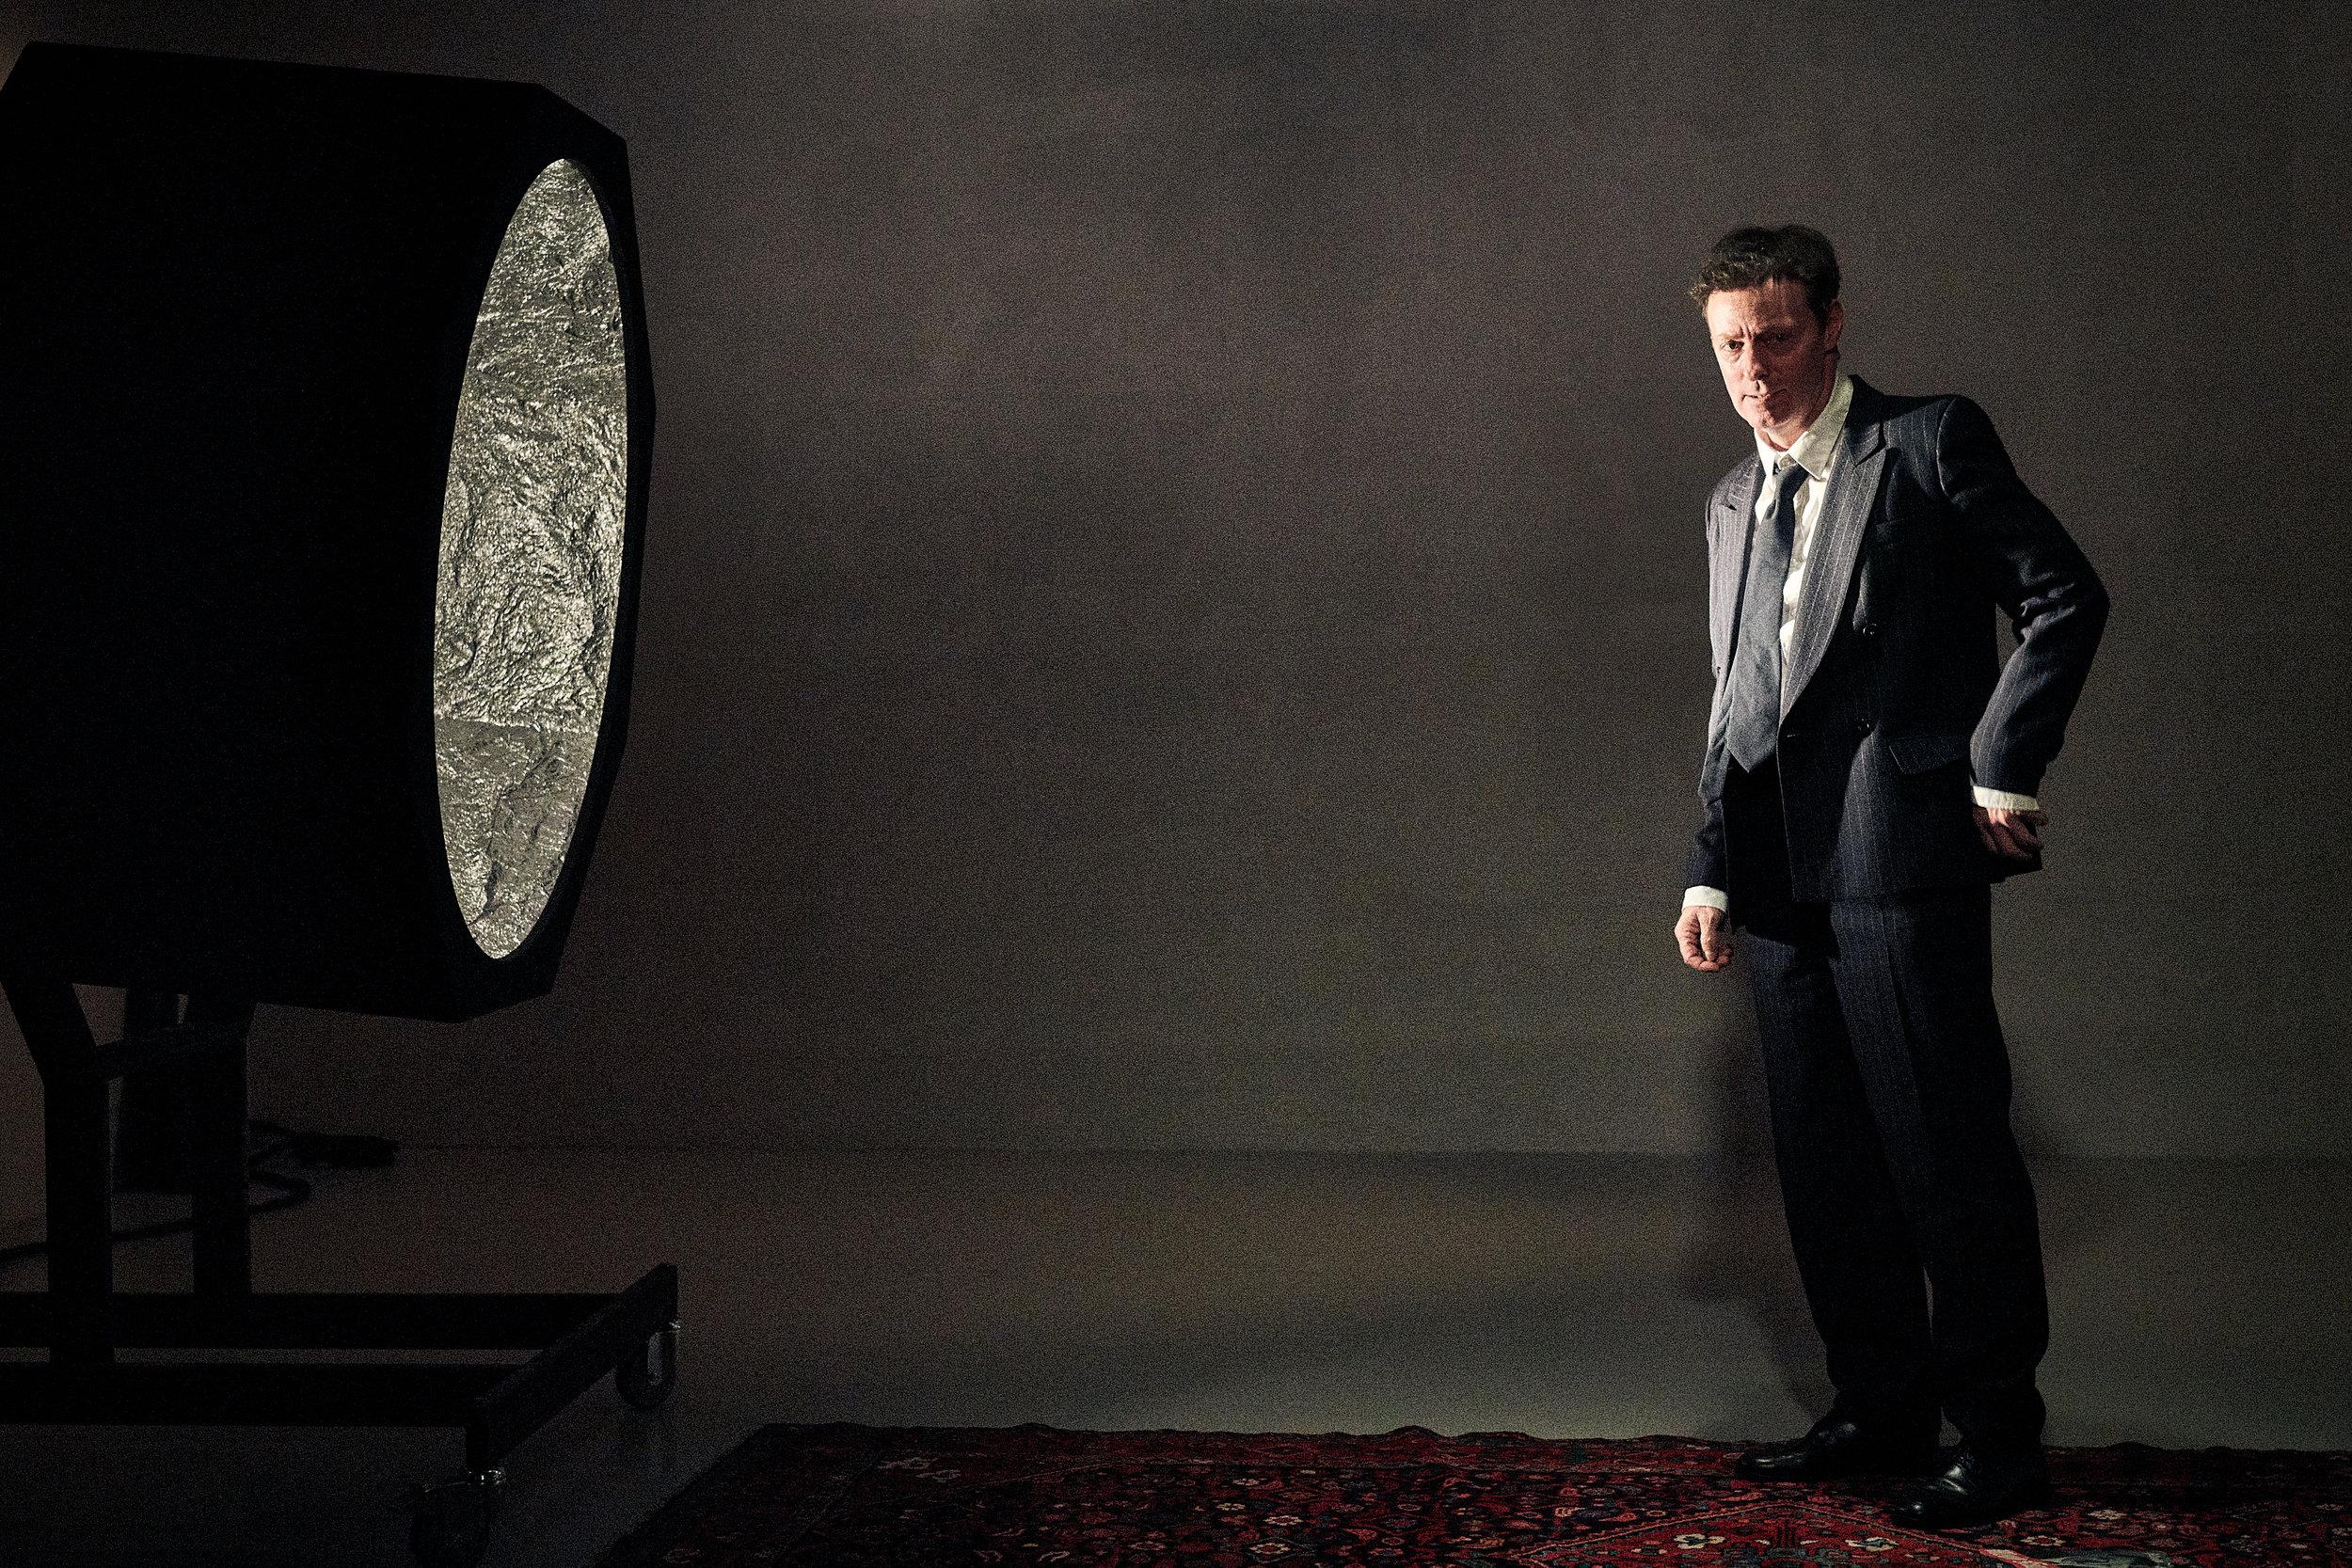 Fotograf: Henrik Ohsten Rasmussen